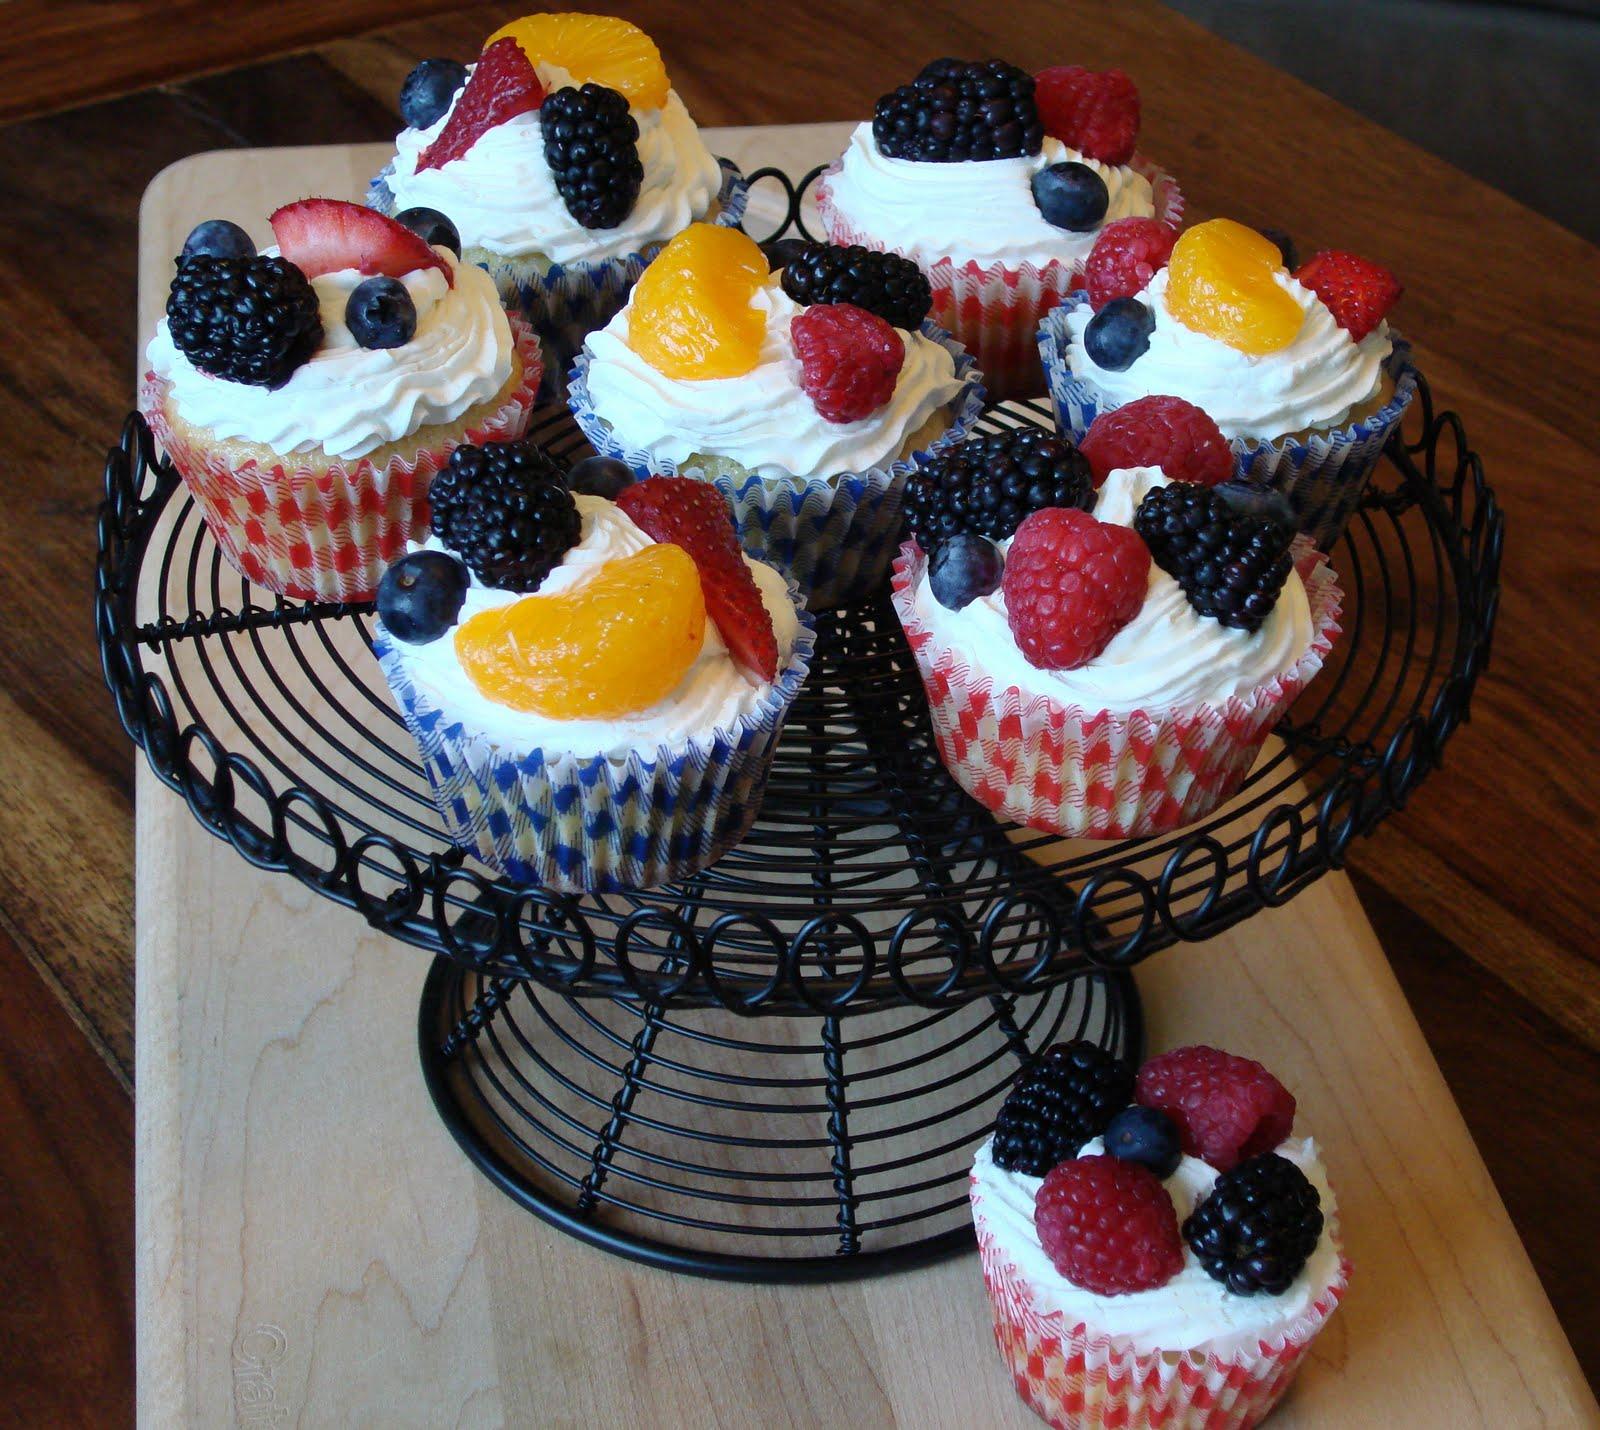 Debby's Cakes: Celebrating Memorial Day with Vanilla bean ...